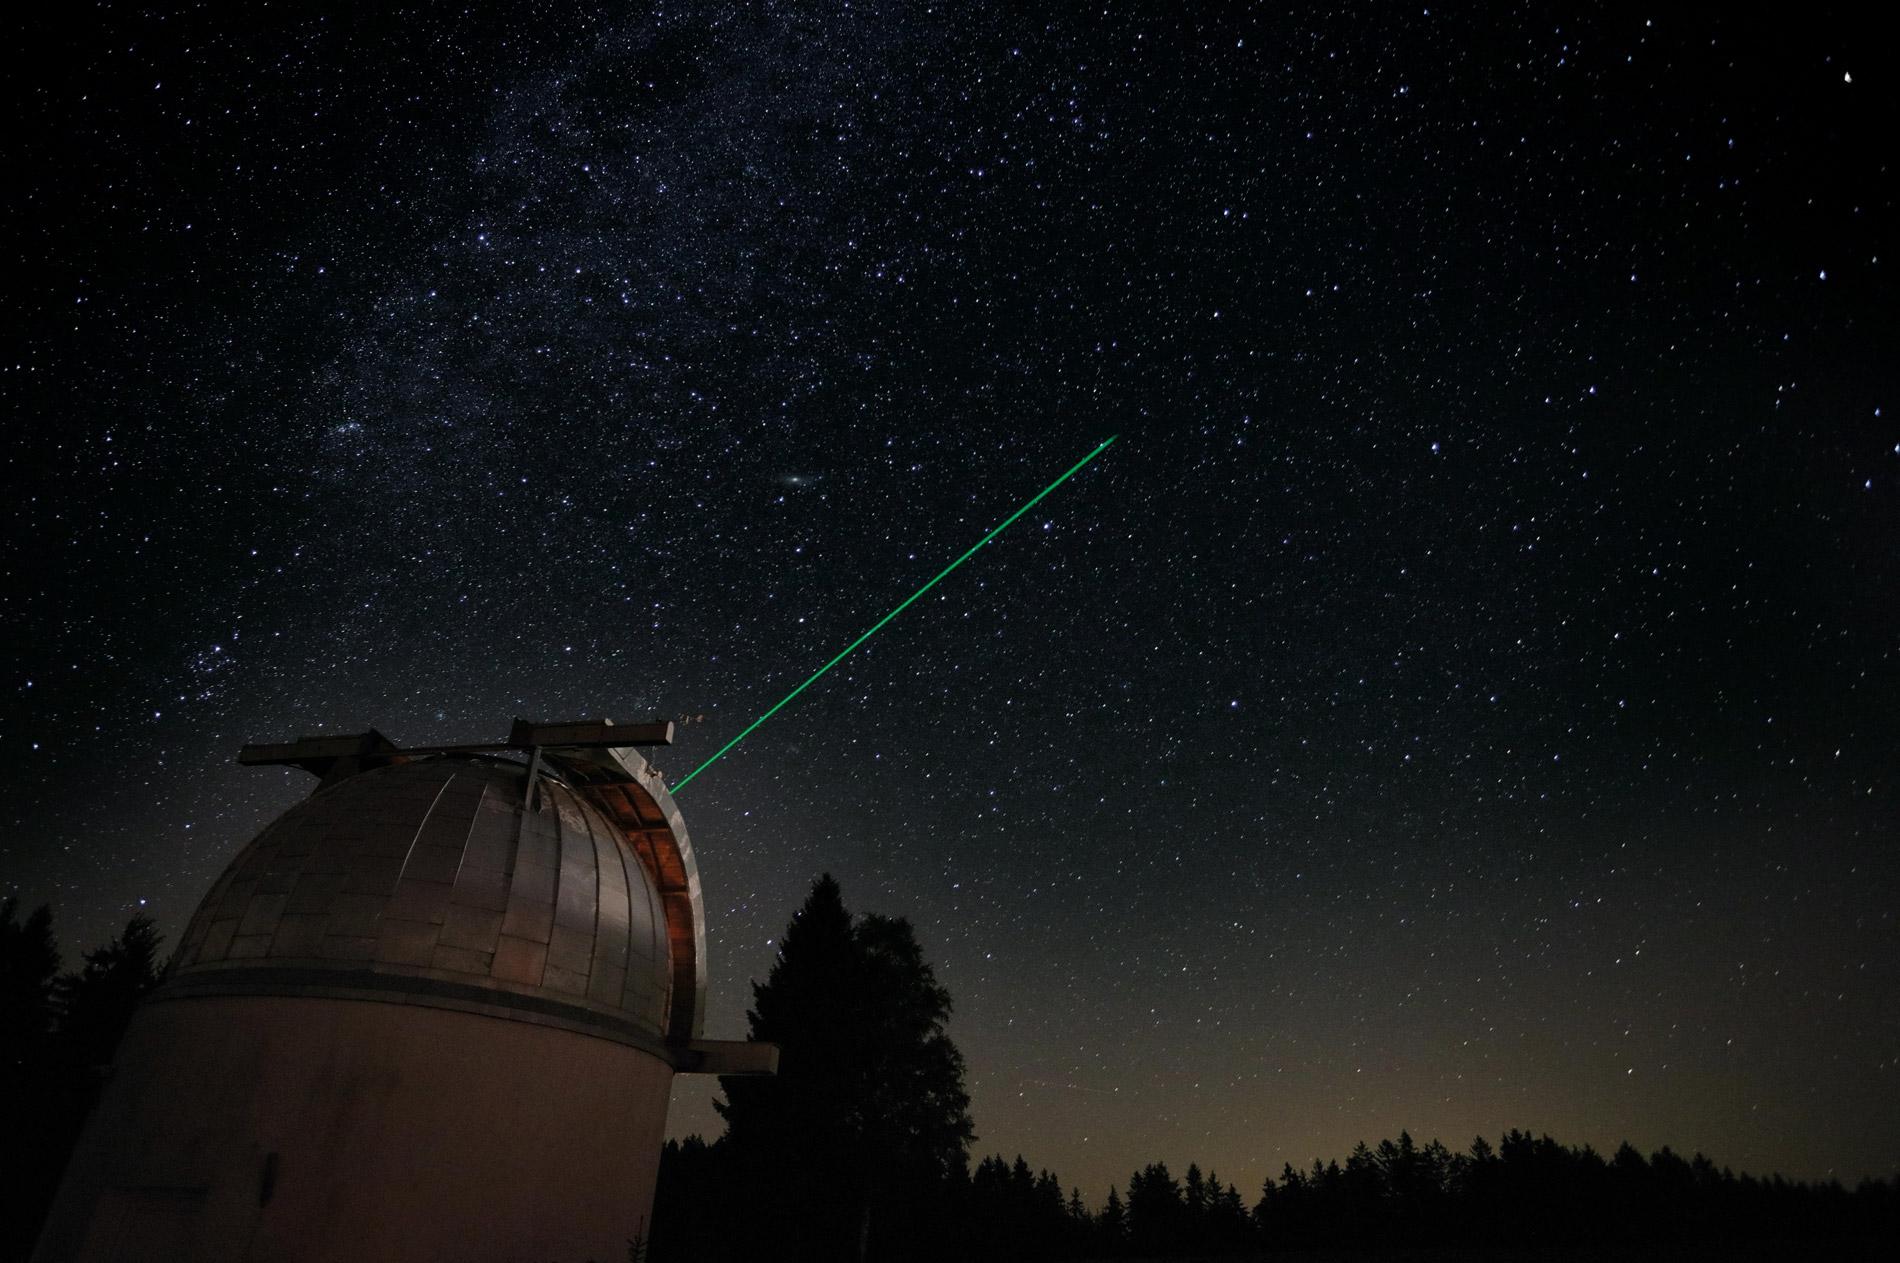 Laser Sandl in Austira